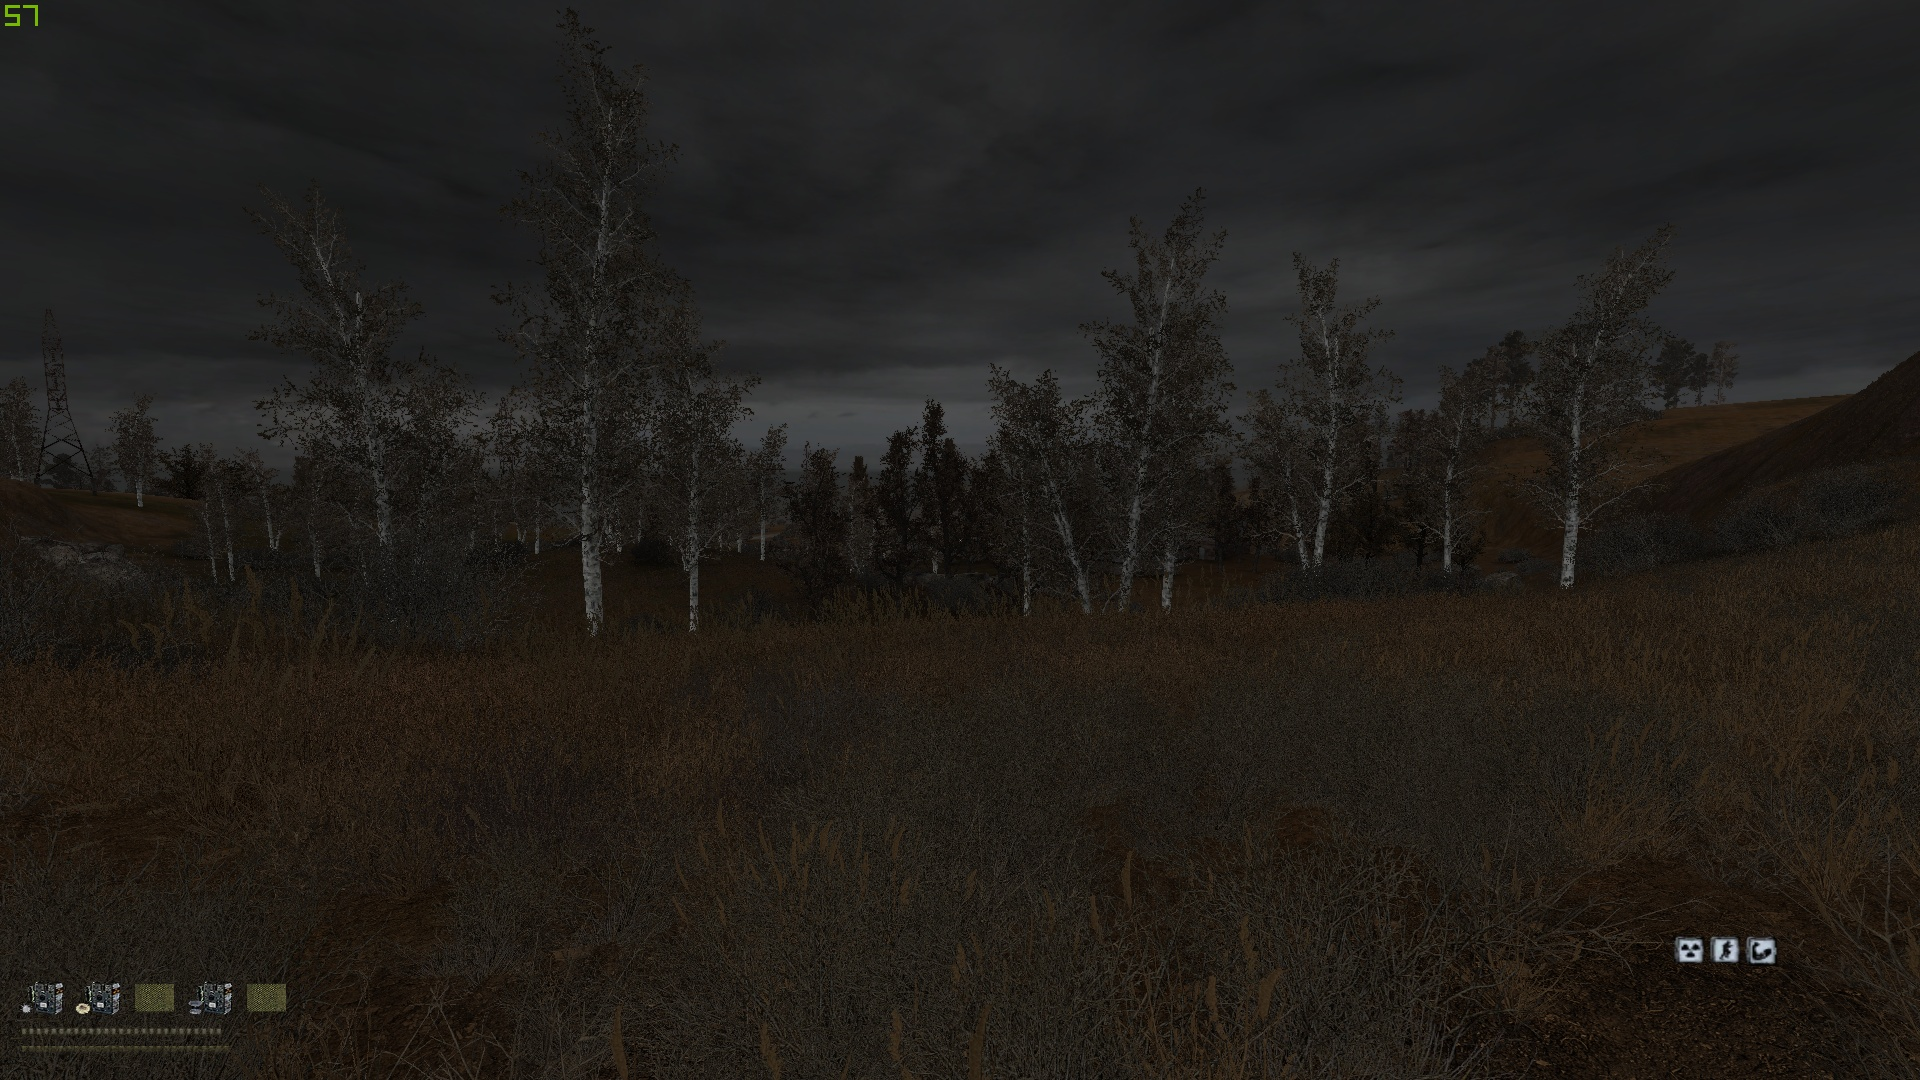 ss_Администратор_05-22-18_14-31-52_(zaton).jpg - S.T.A.L.K.E.R.: Call of Pripyat